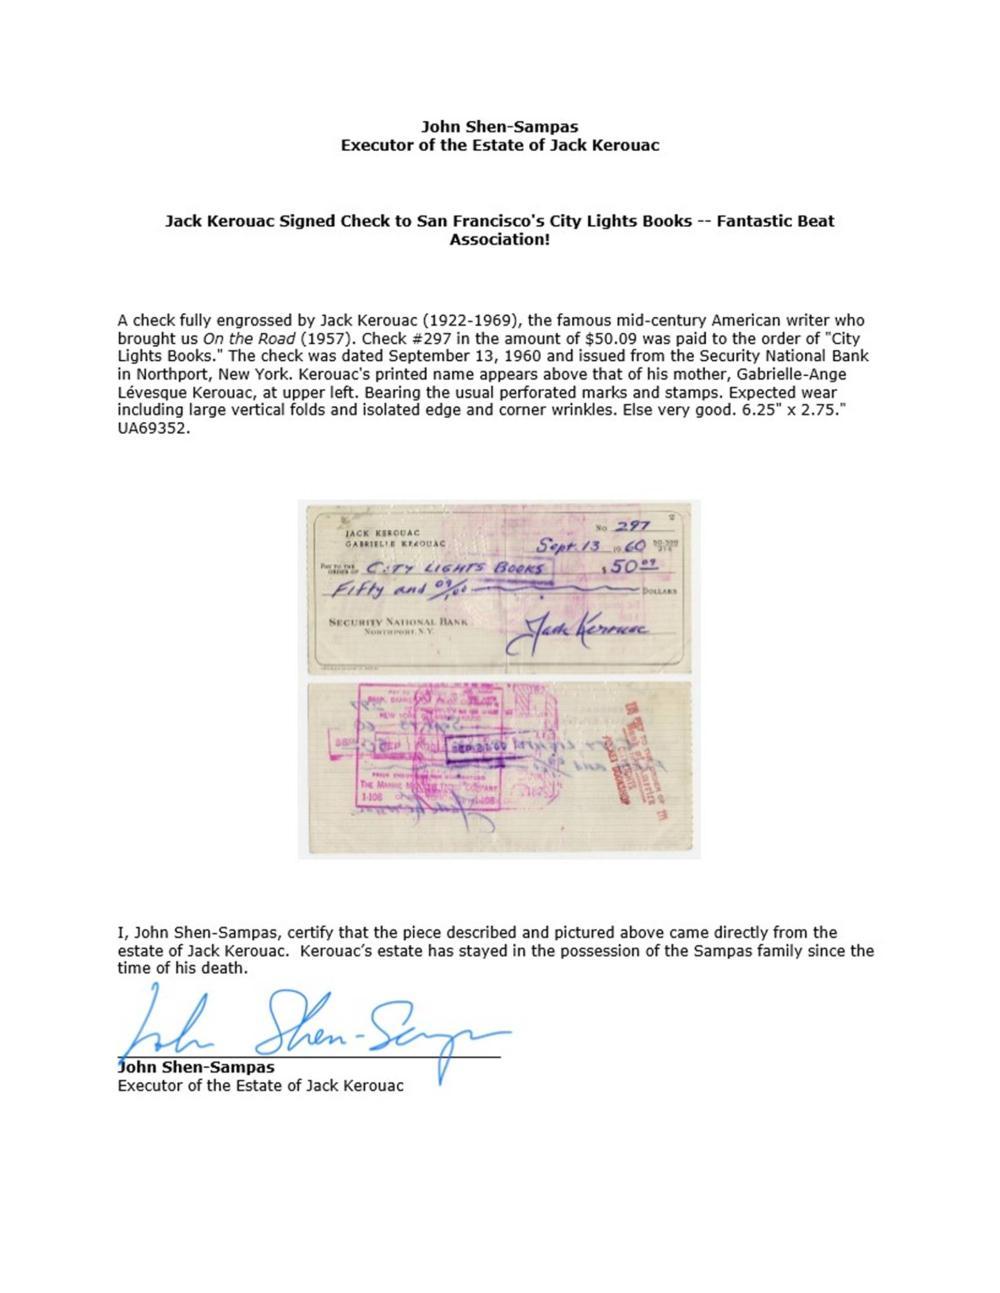 Jack Kerouac Signed Check to San Francisco's City Lights Books -- Fantastic Beat Association!